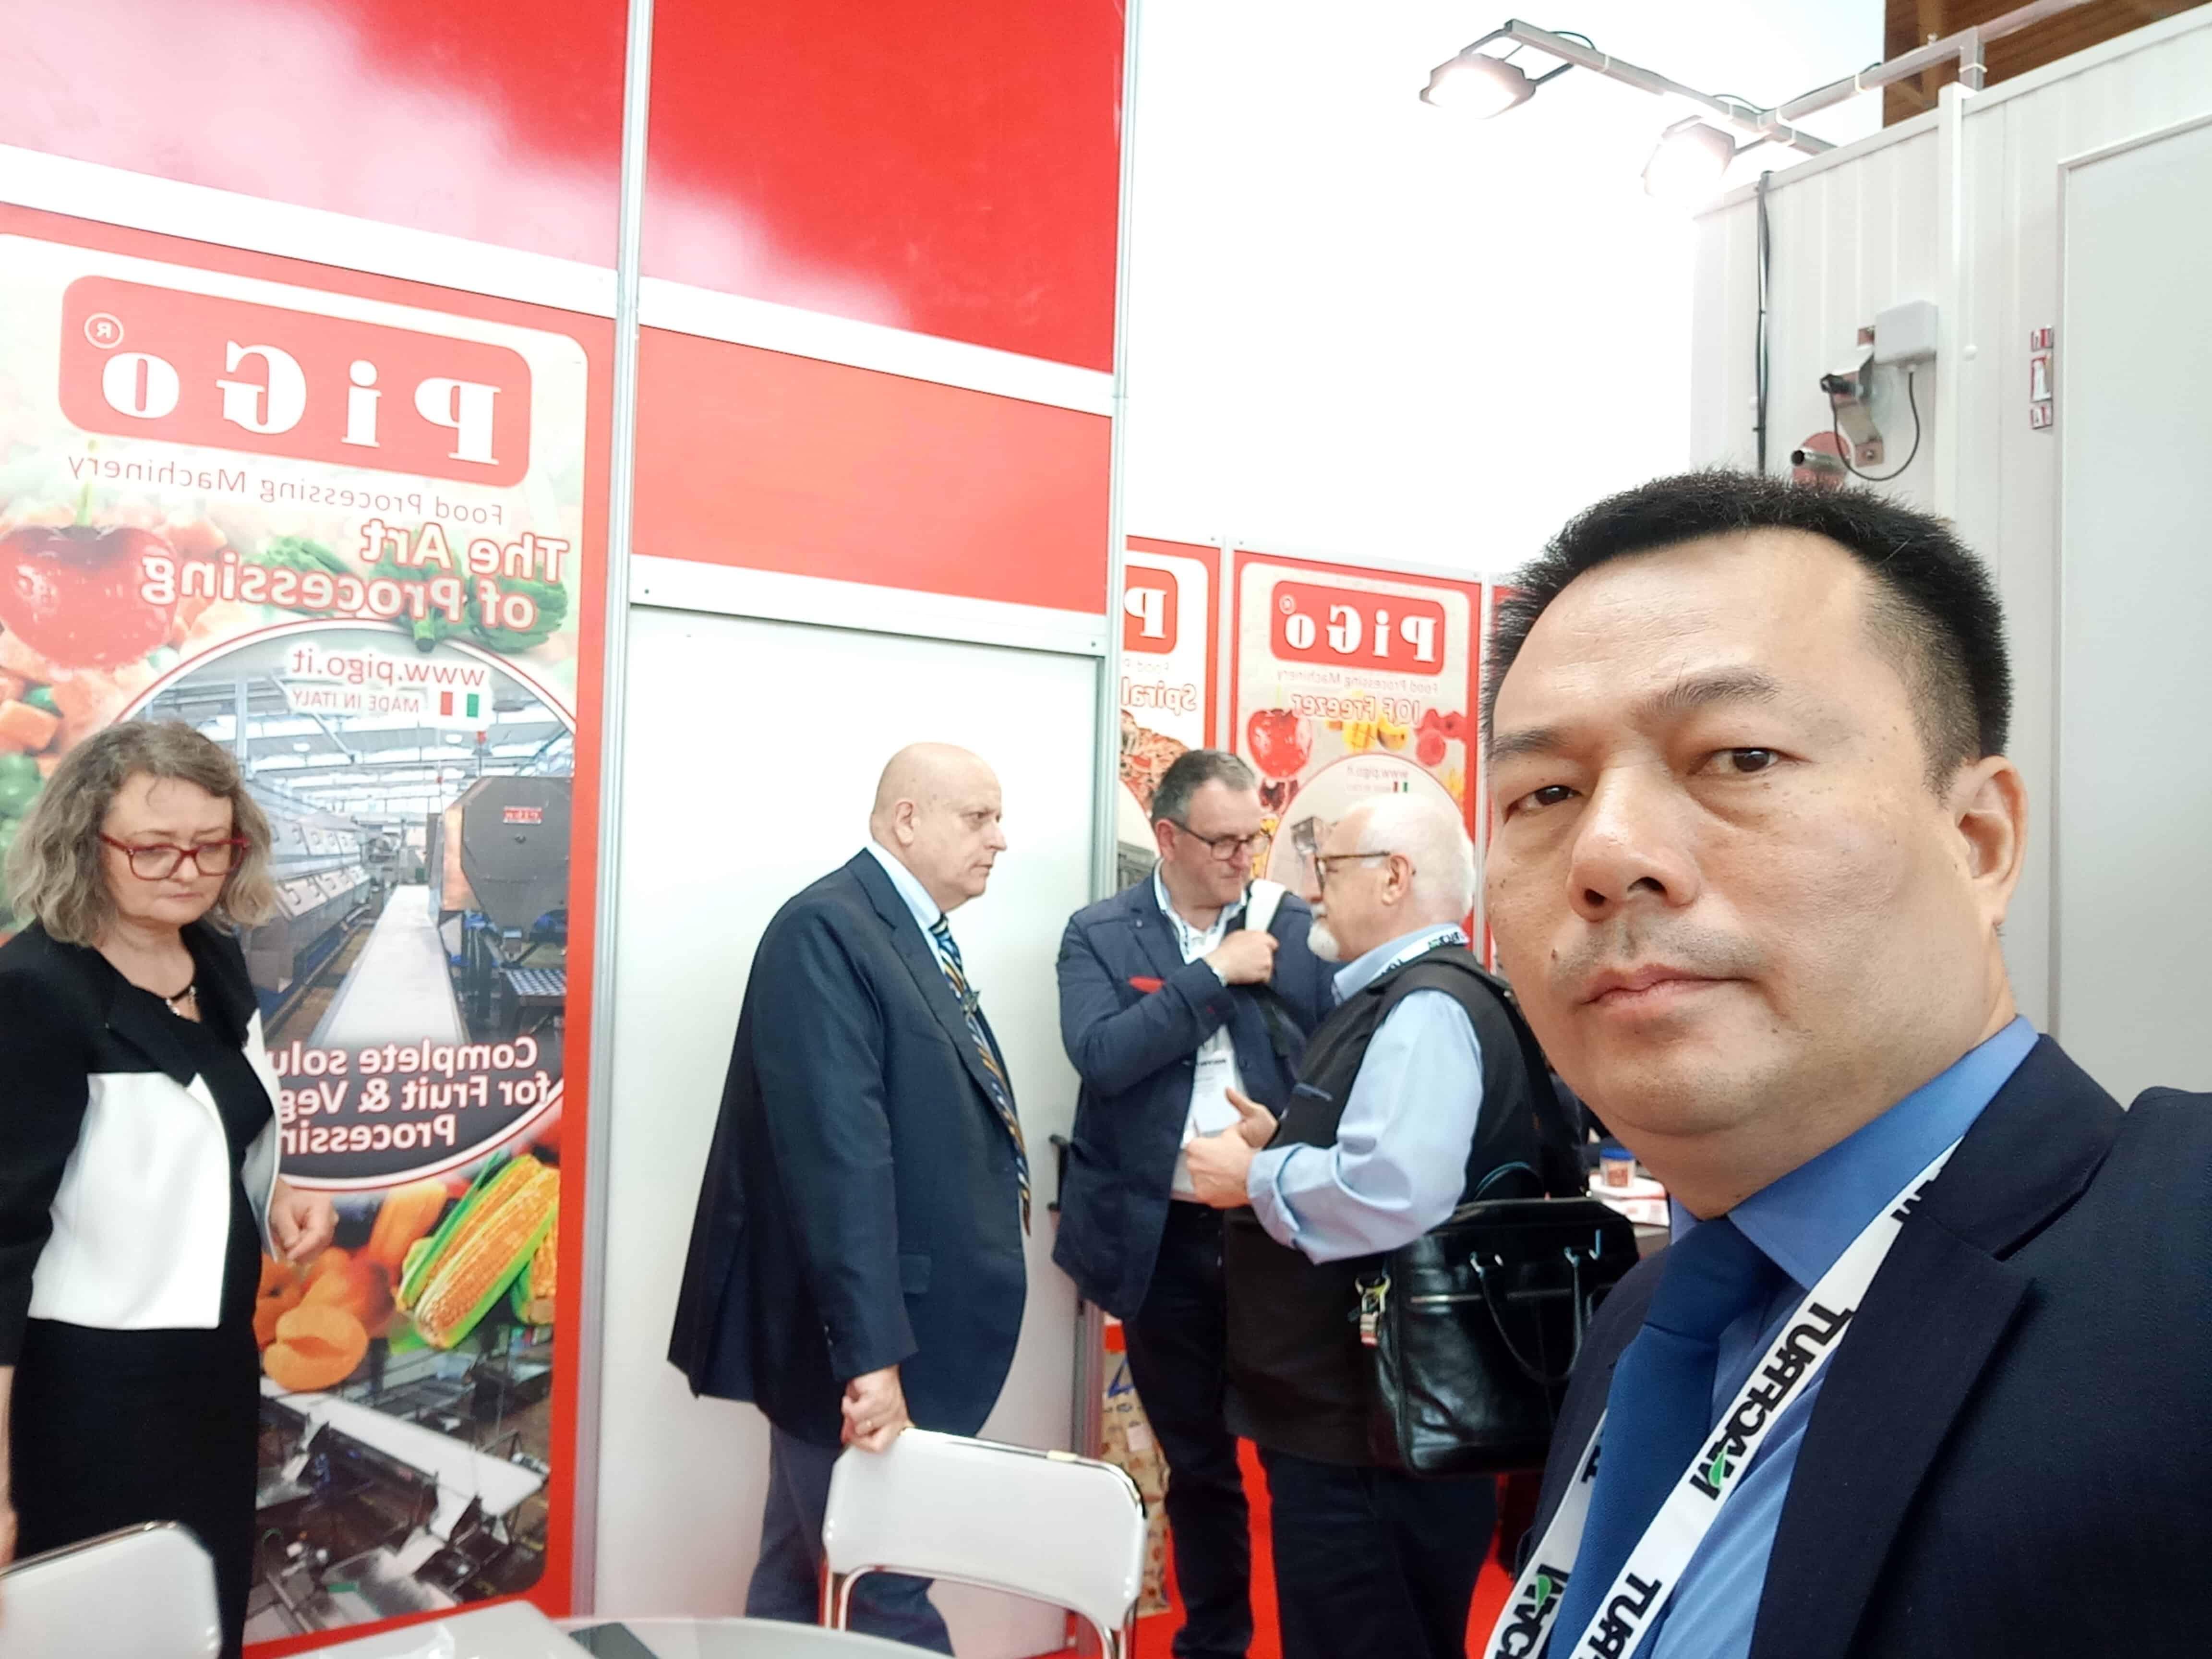 Kim Nguyễn Corporation